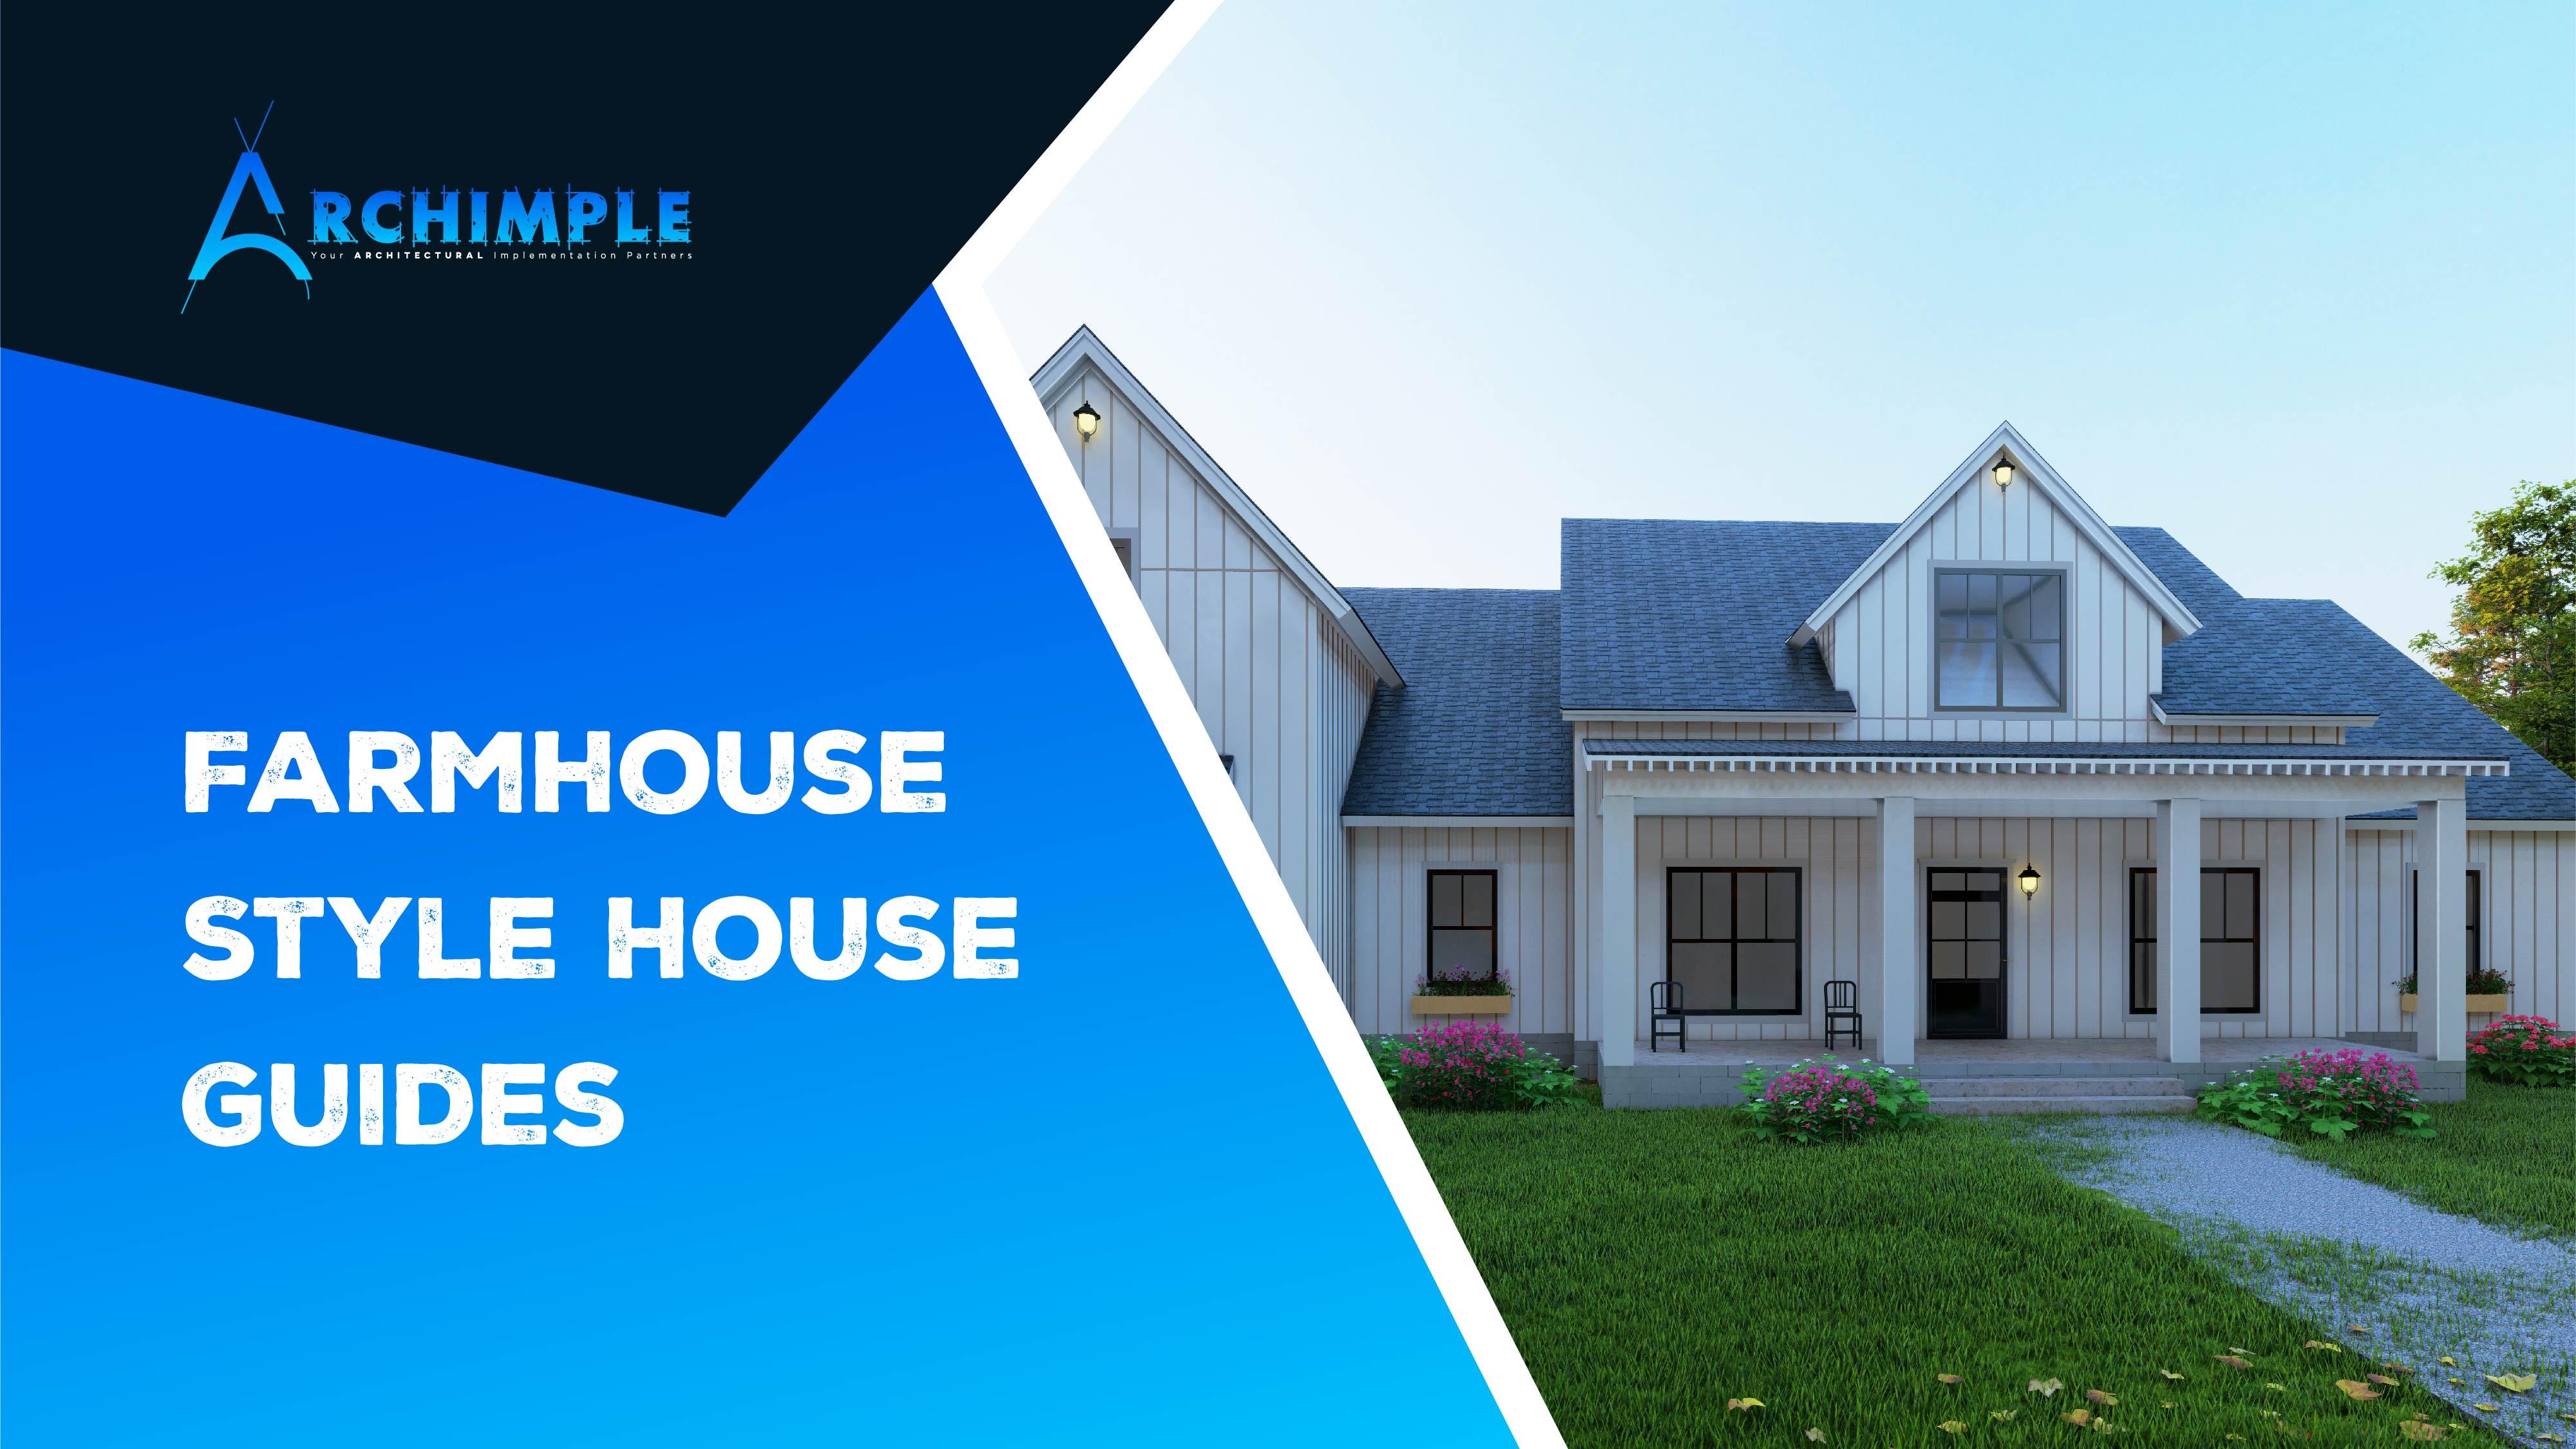 Farmhouse Style House Guides